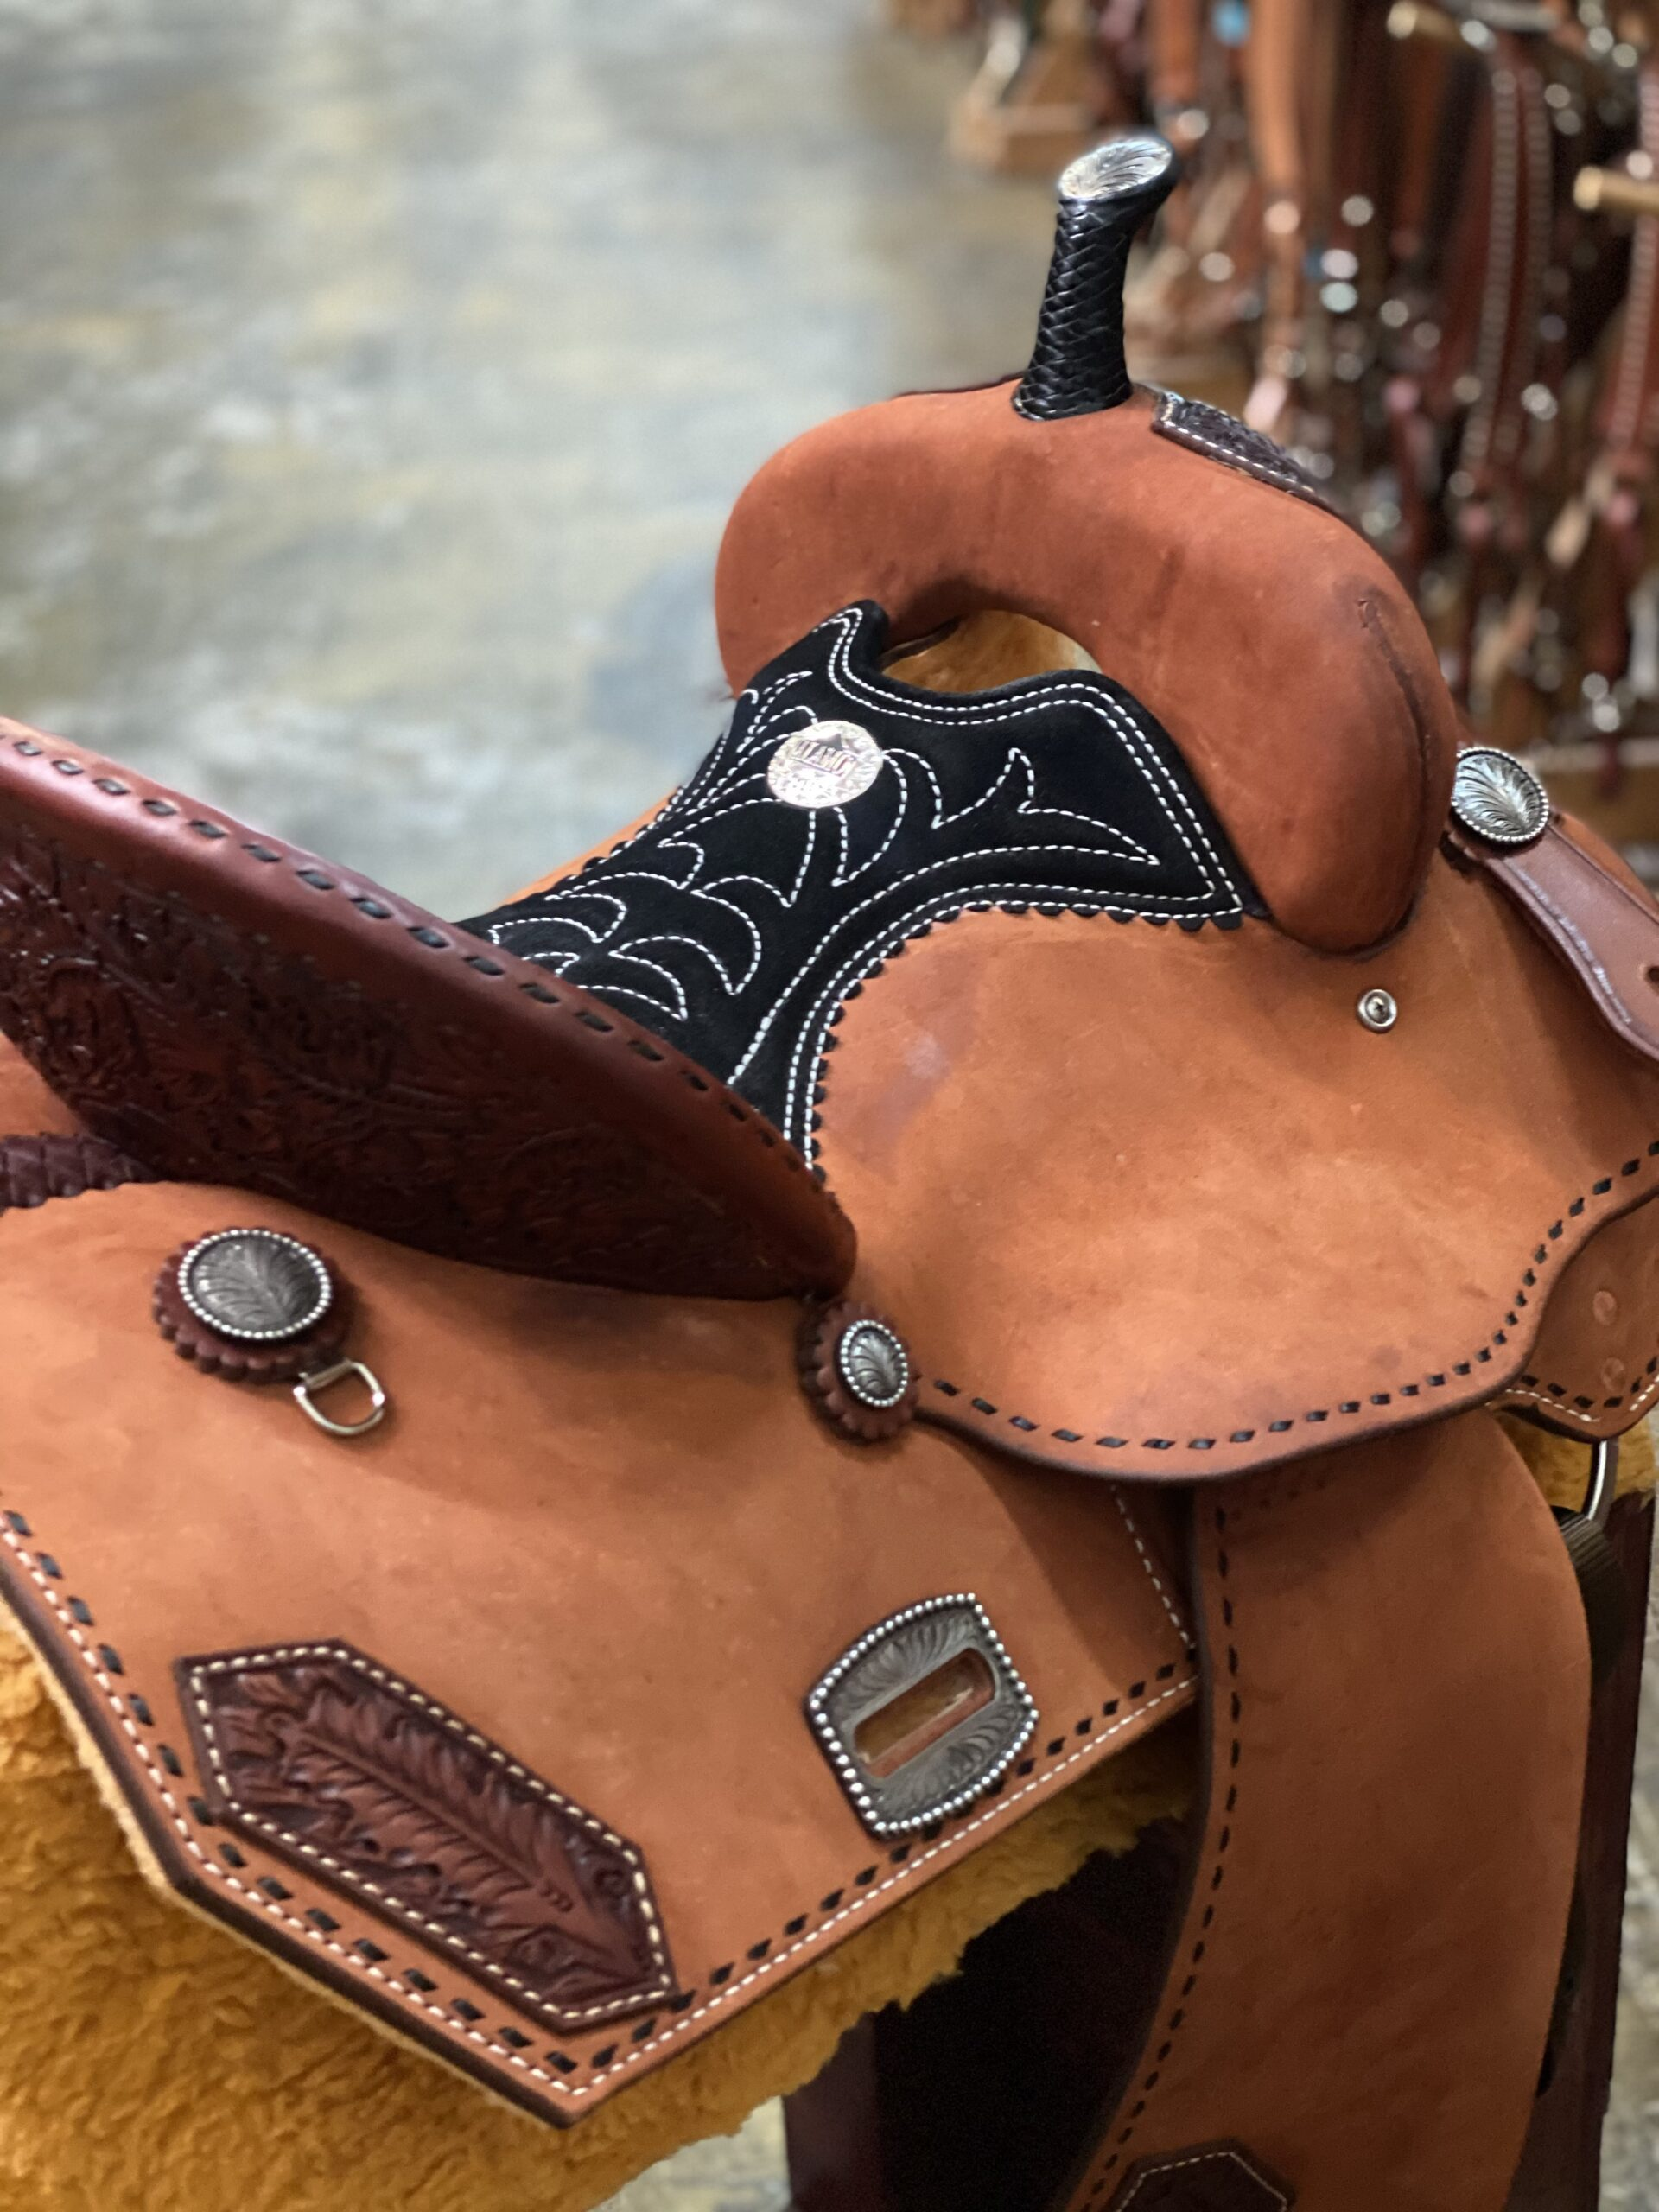 <b>14.5in</b><p> SD 0818 Barrel/pleasure saddle </P>